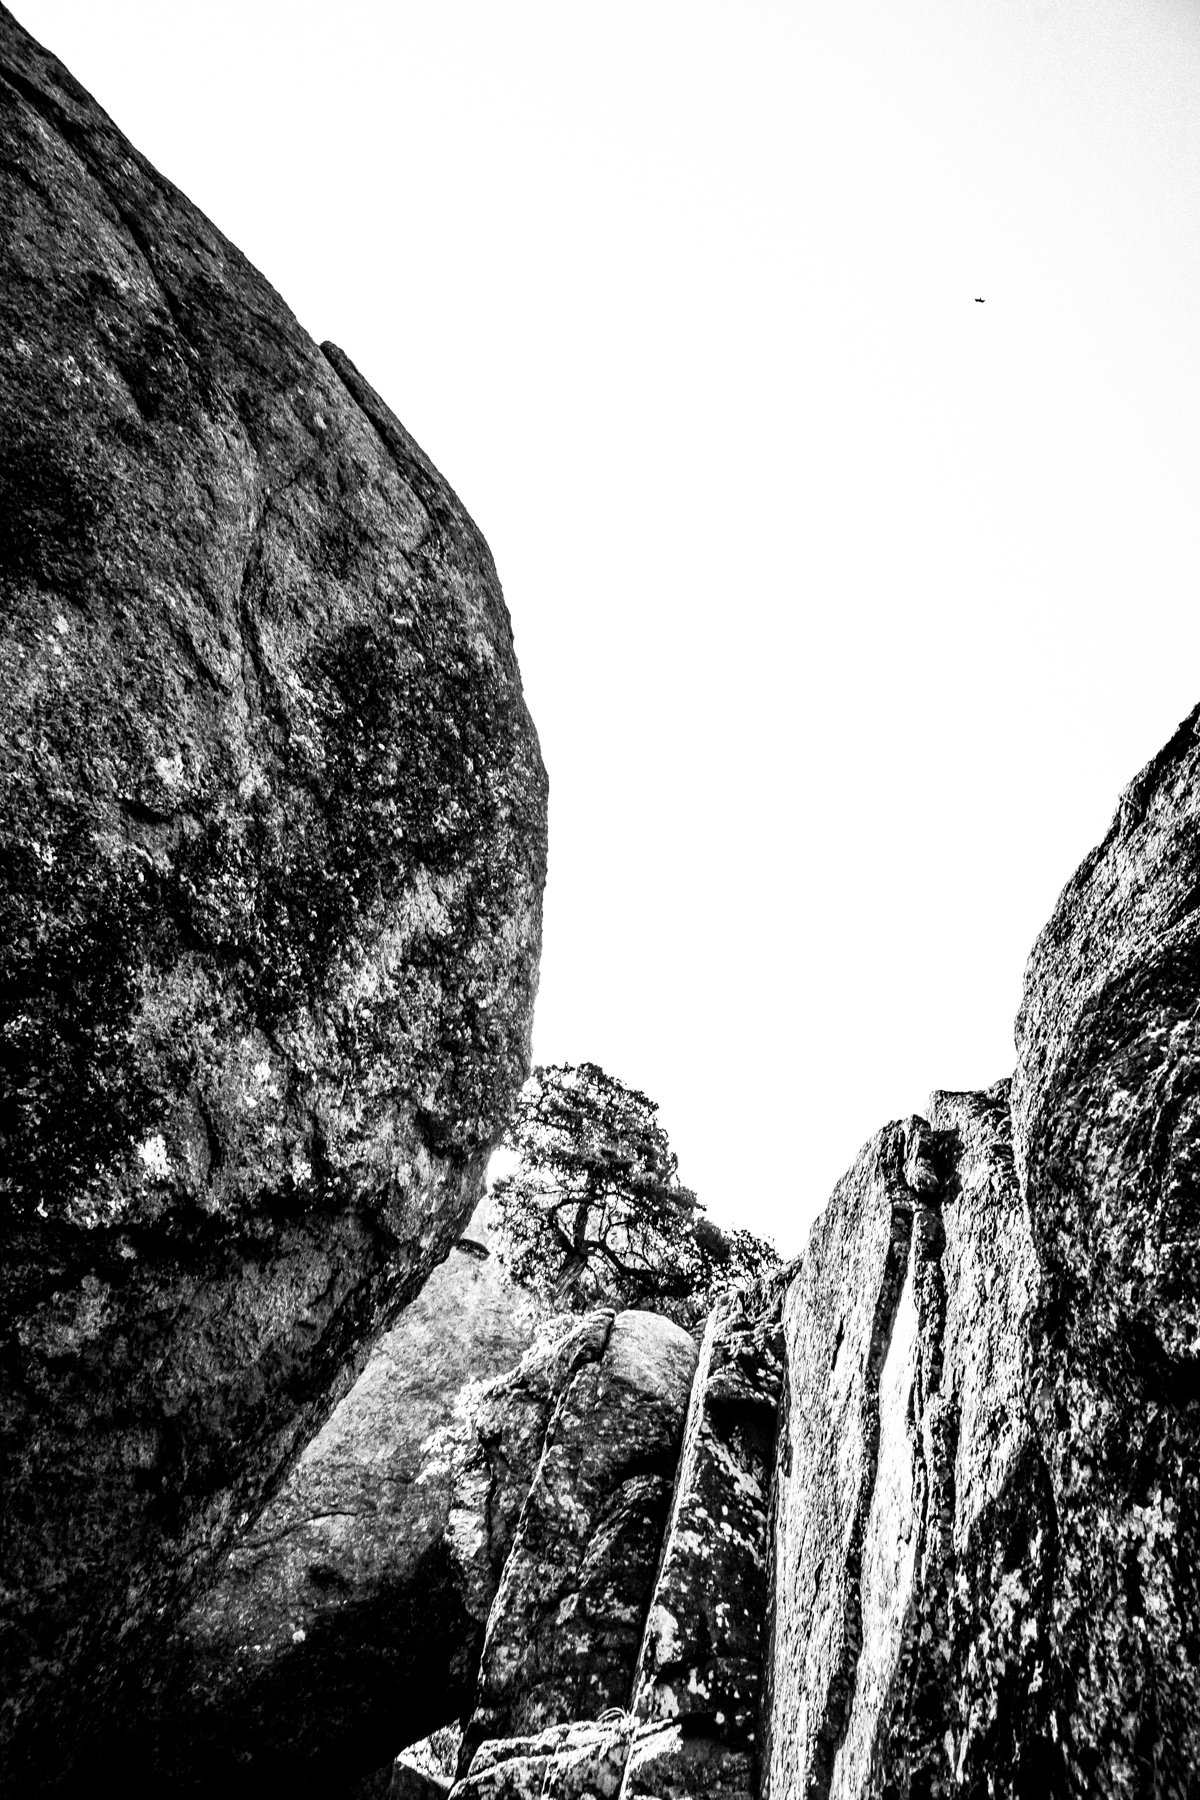 2017-06-25 Mount Lincoln B (4 of 20).jpg